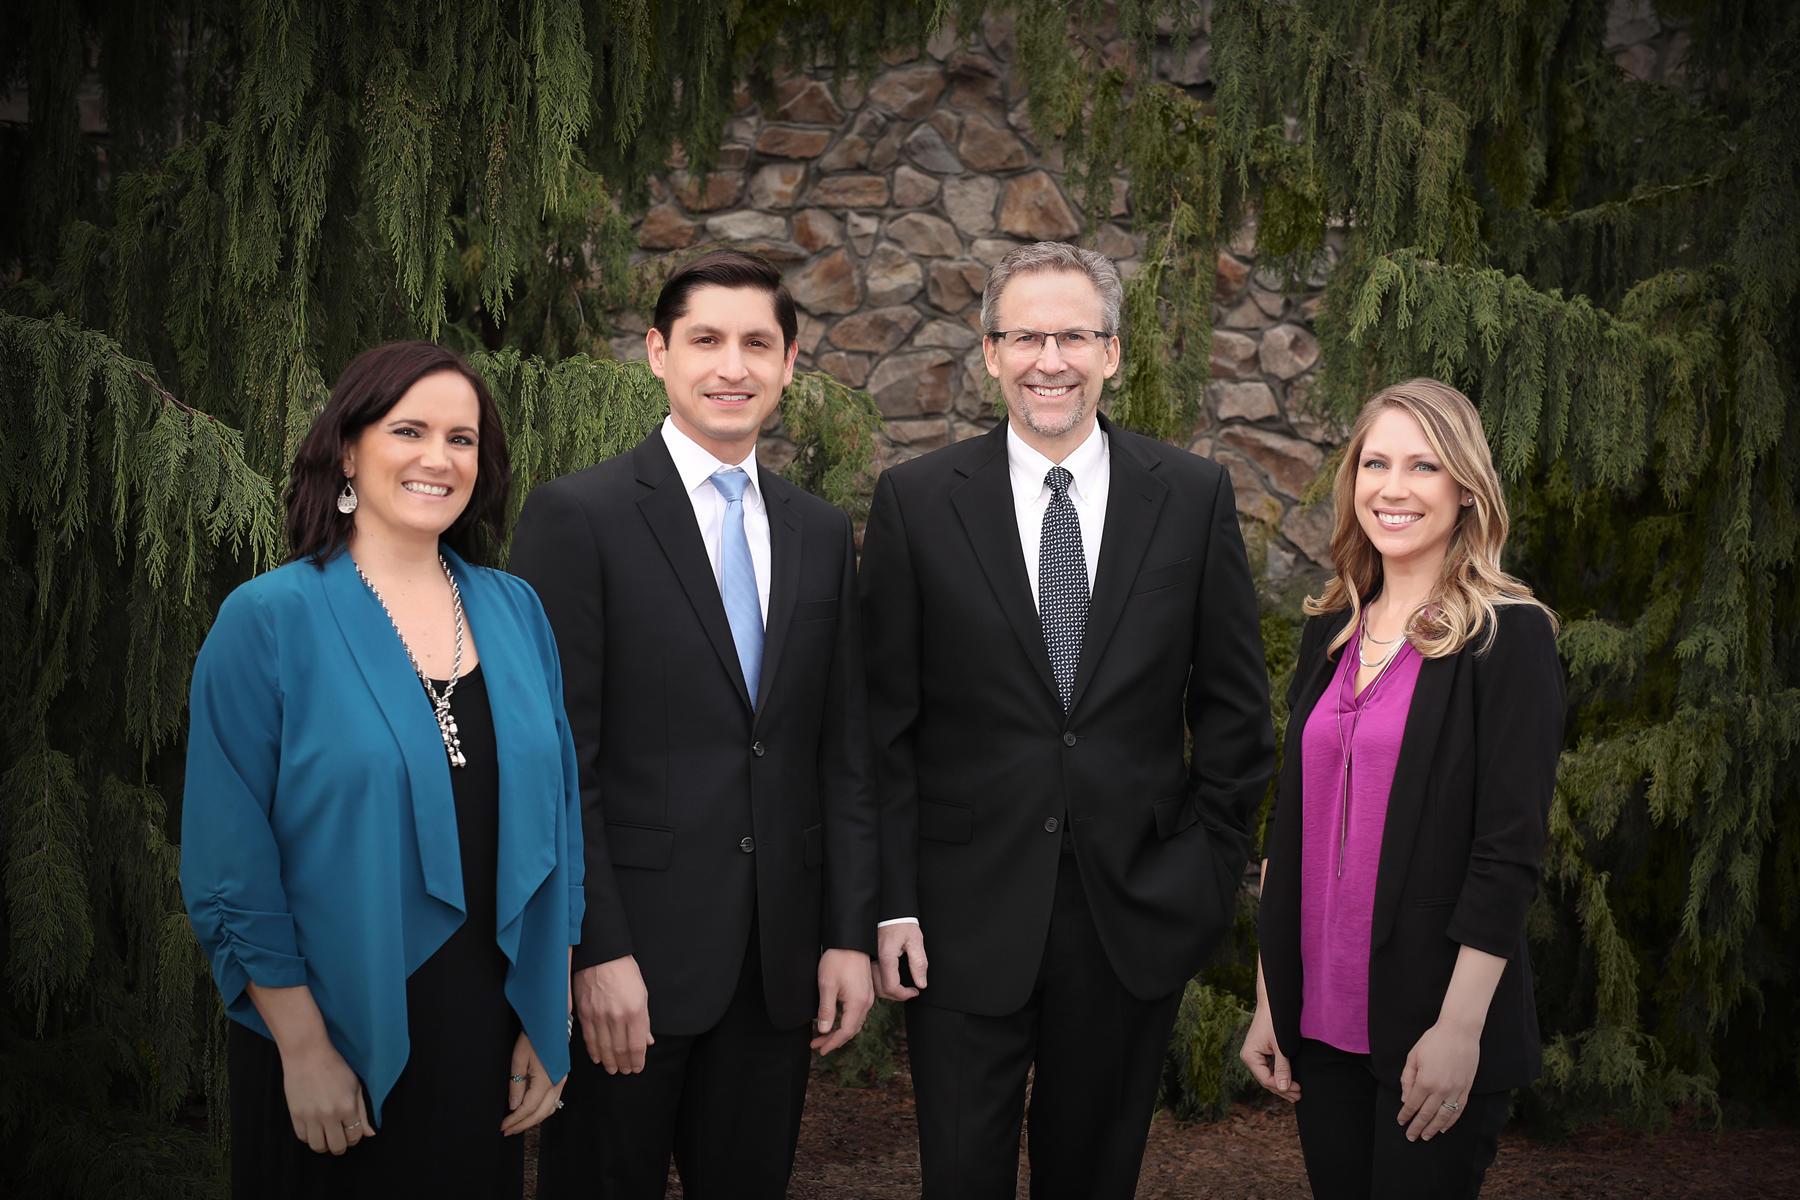 The Painted Rocks Group | Yakima, WA | Morgan Stanley Wealth Management